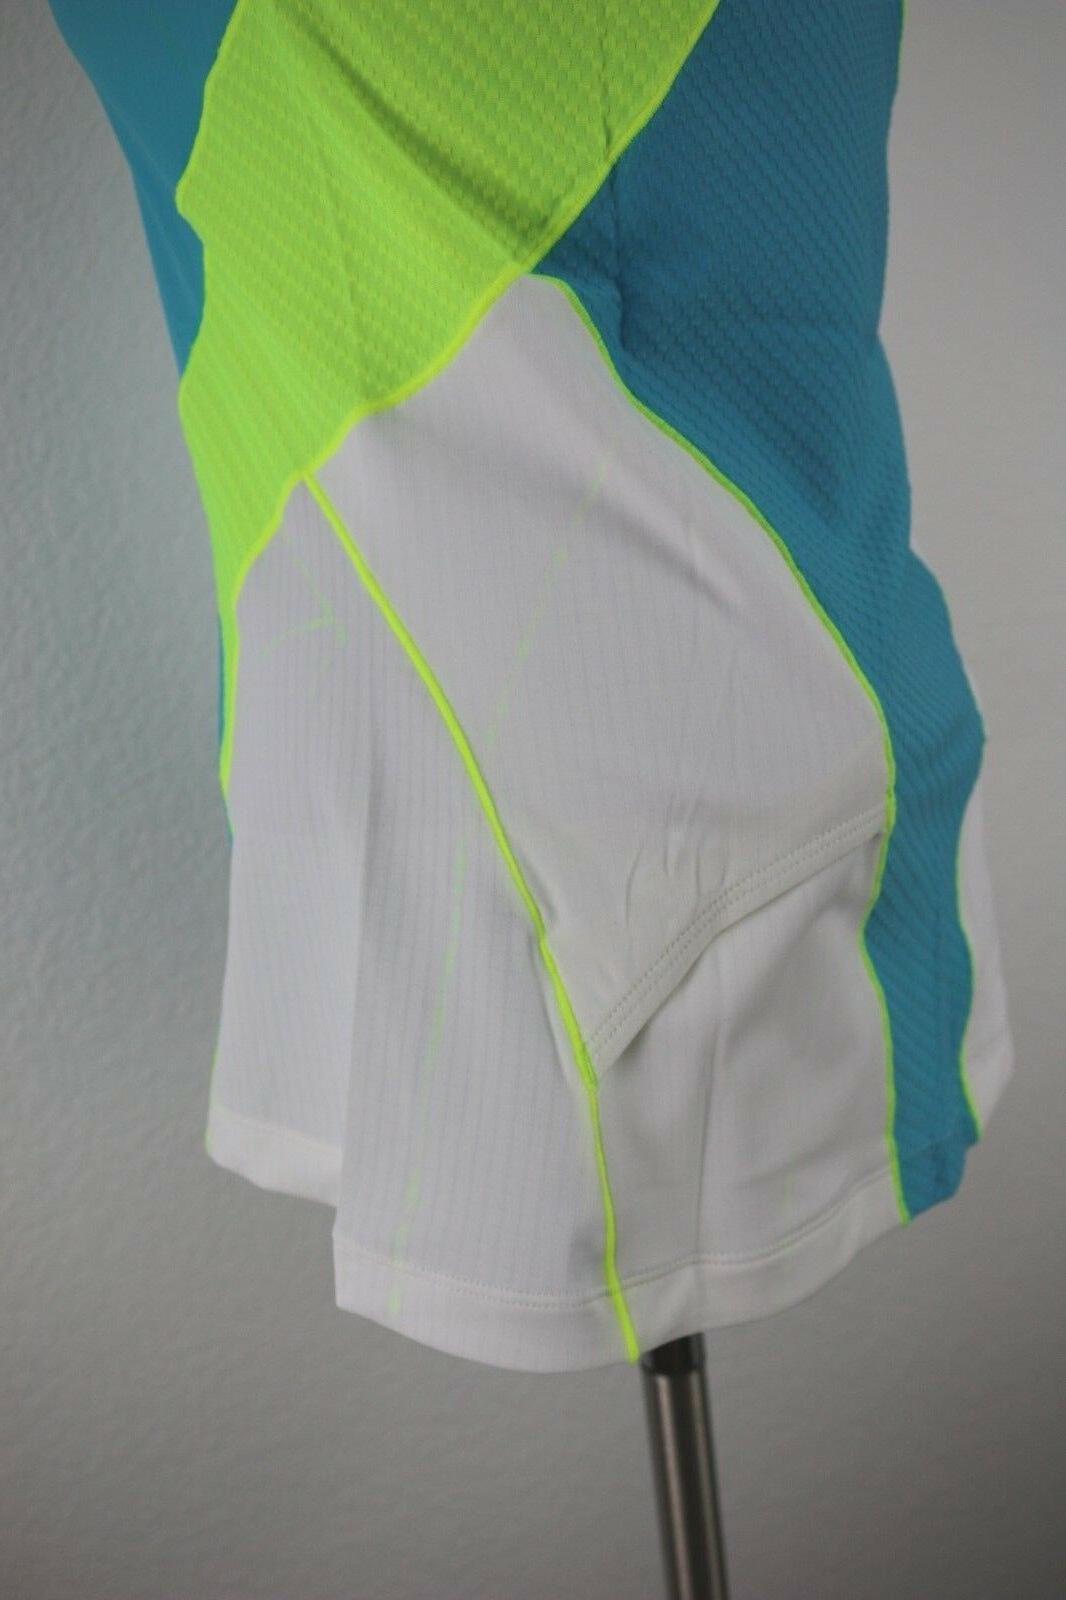 NWD Pearl Women's P.R.O. In-R-Cool Tri SL Jersey XL